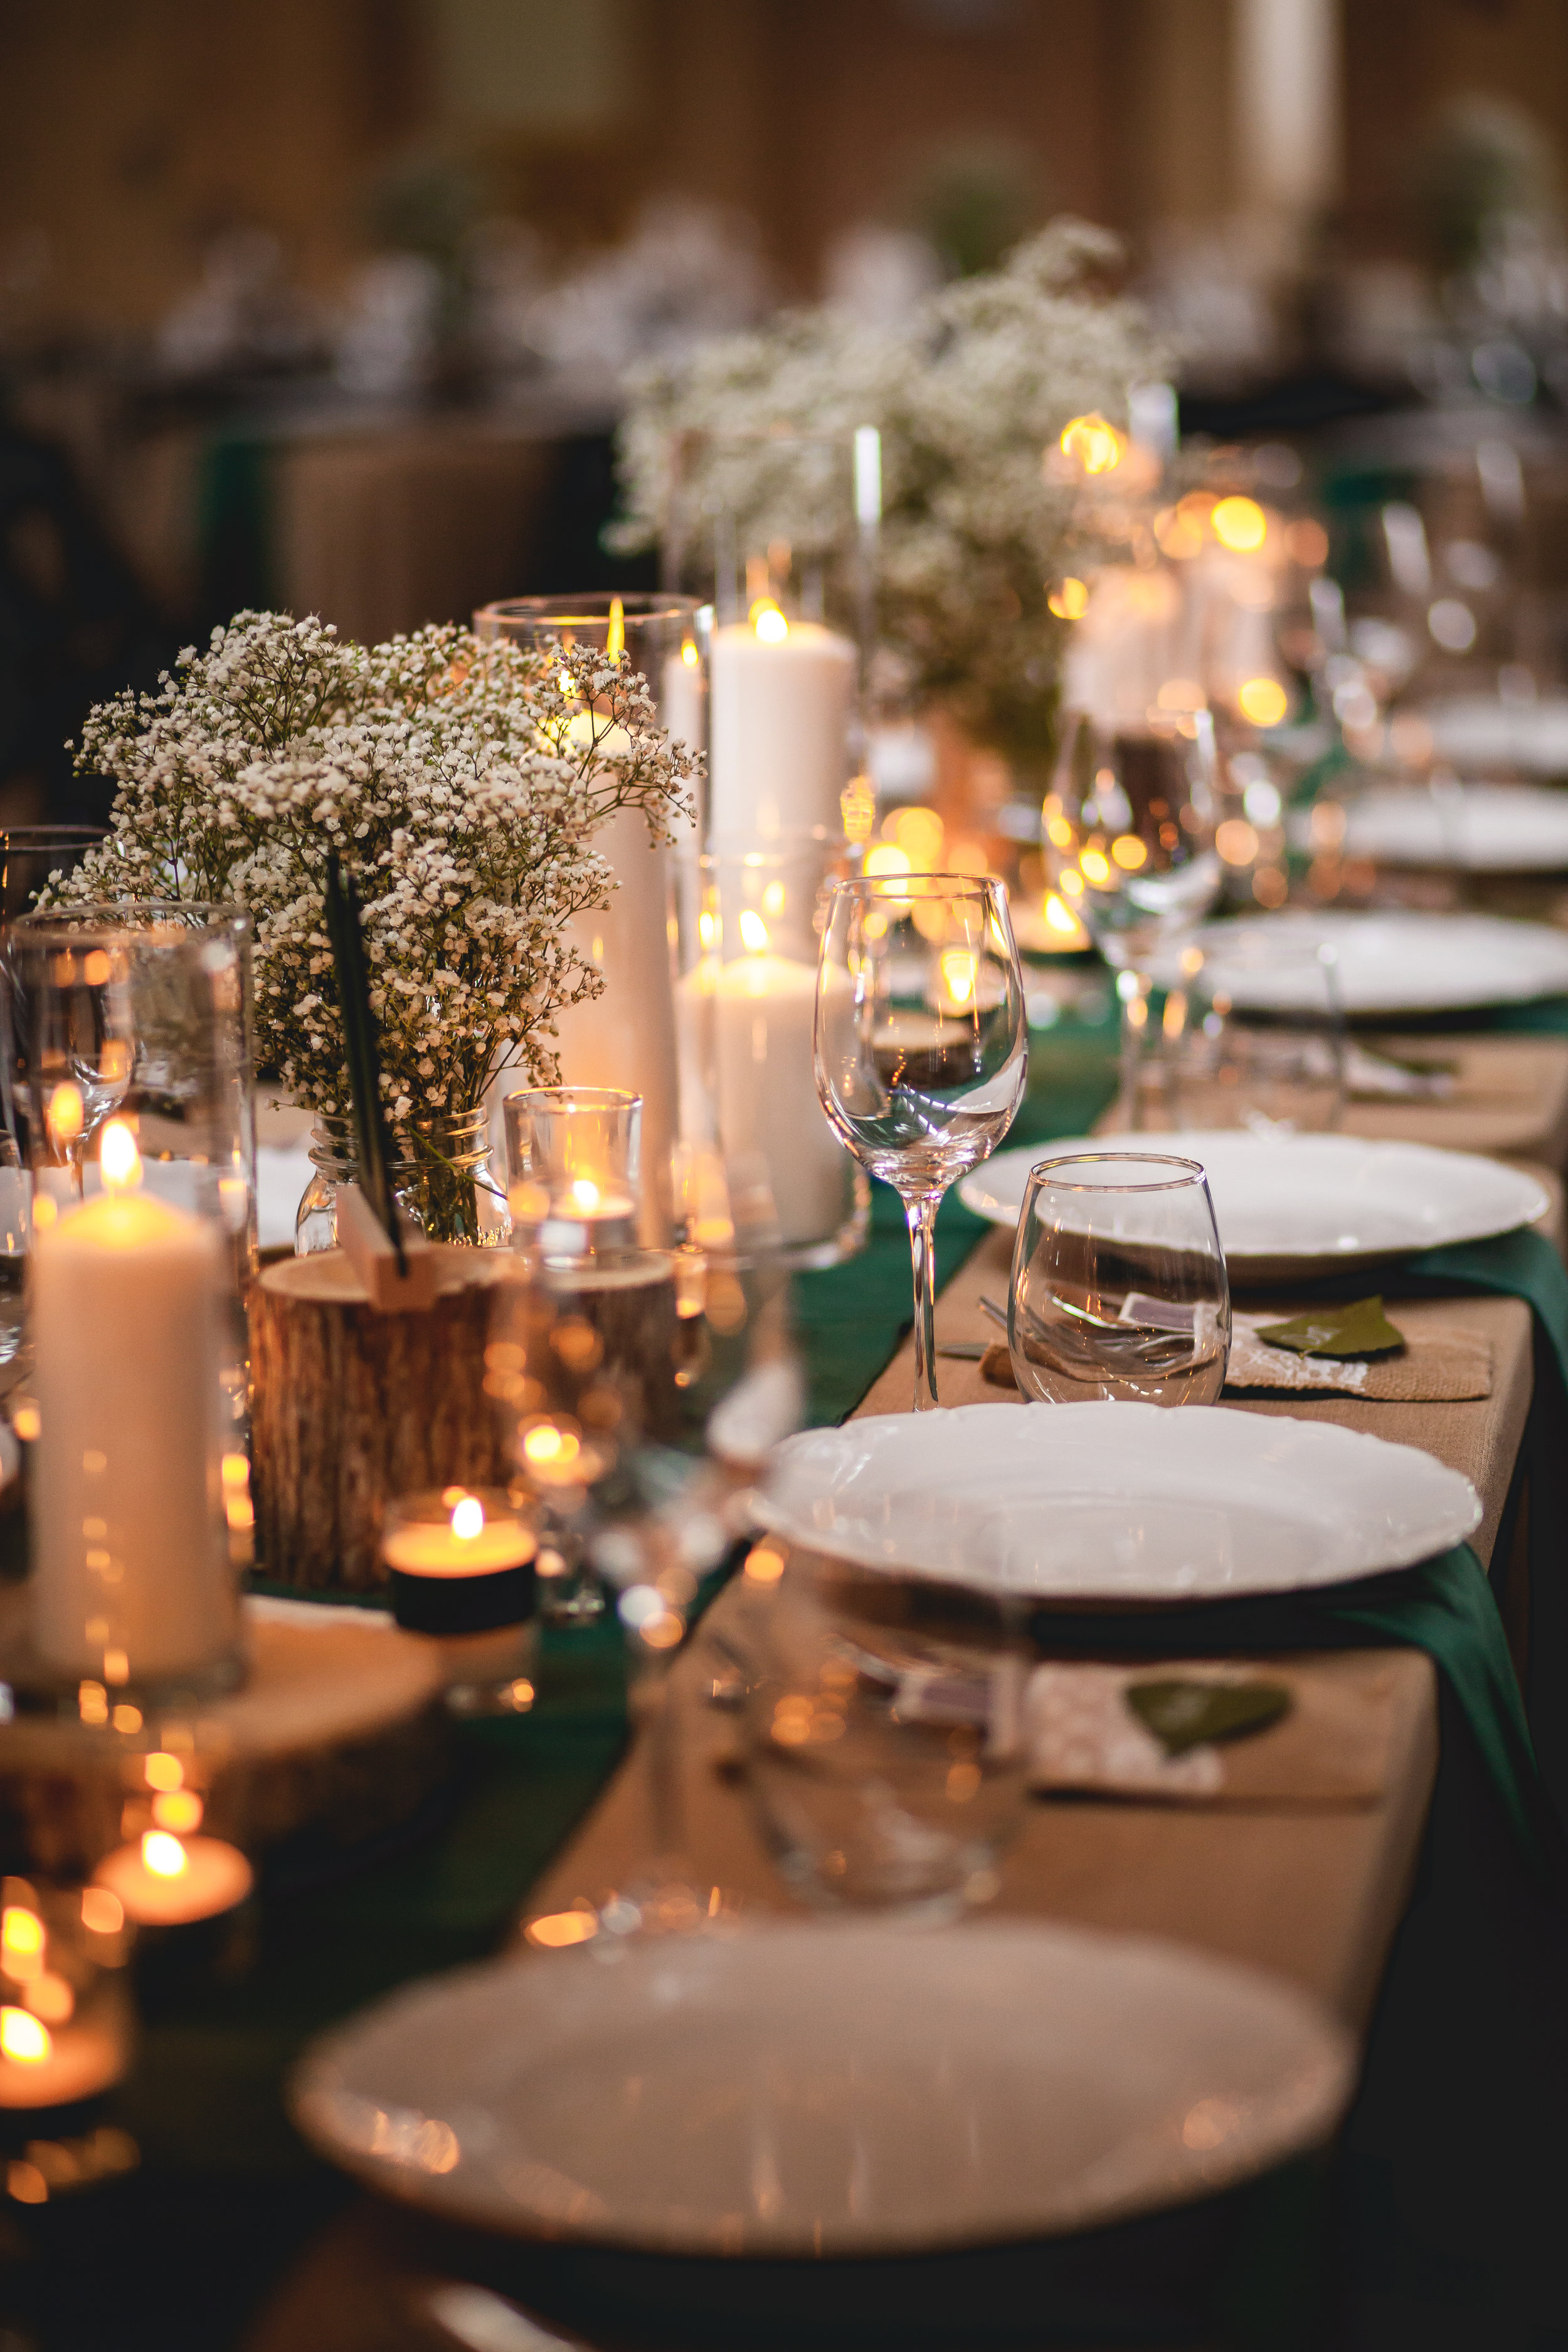 Amy D Photography- Winter Wedding- Tiffin Centre- Vintage Wedding Decor- Rustic Wedding- Wedding Decorations- Barrie Wedding Photography- Wedding Decor Ideas- Barrie Weddings (103 of 129).jpg